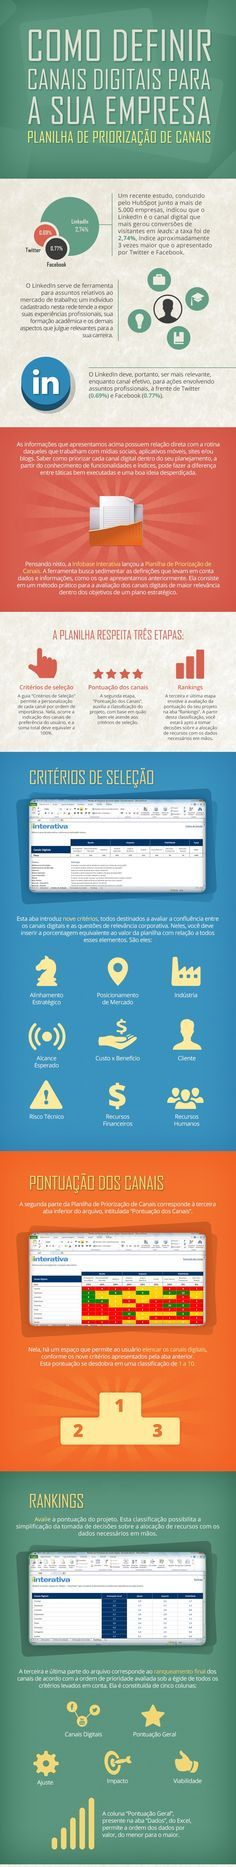 Infográfico: Canais Digitais para Empresas | Fonte: IInterativa